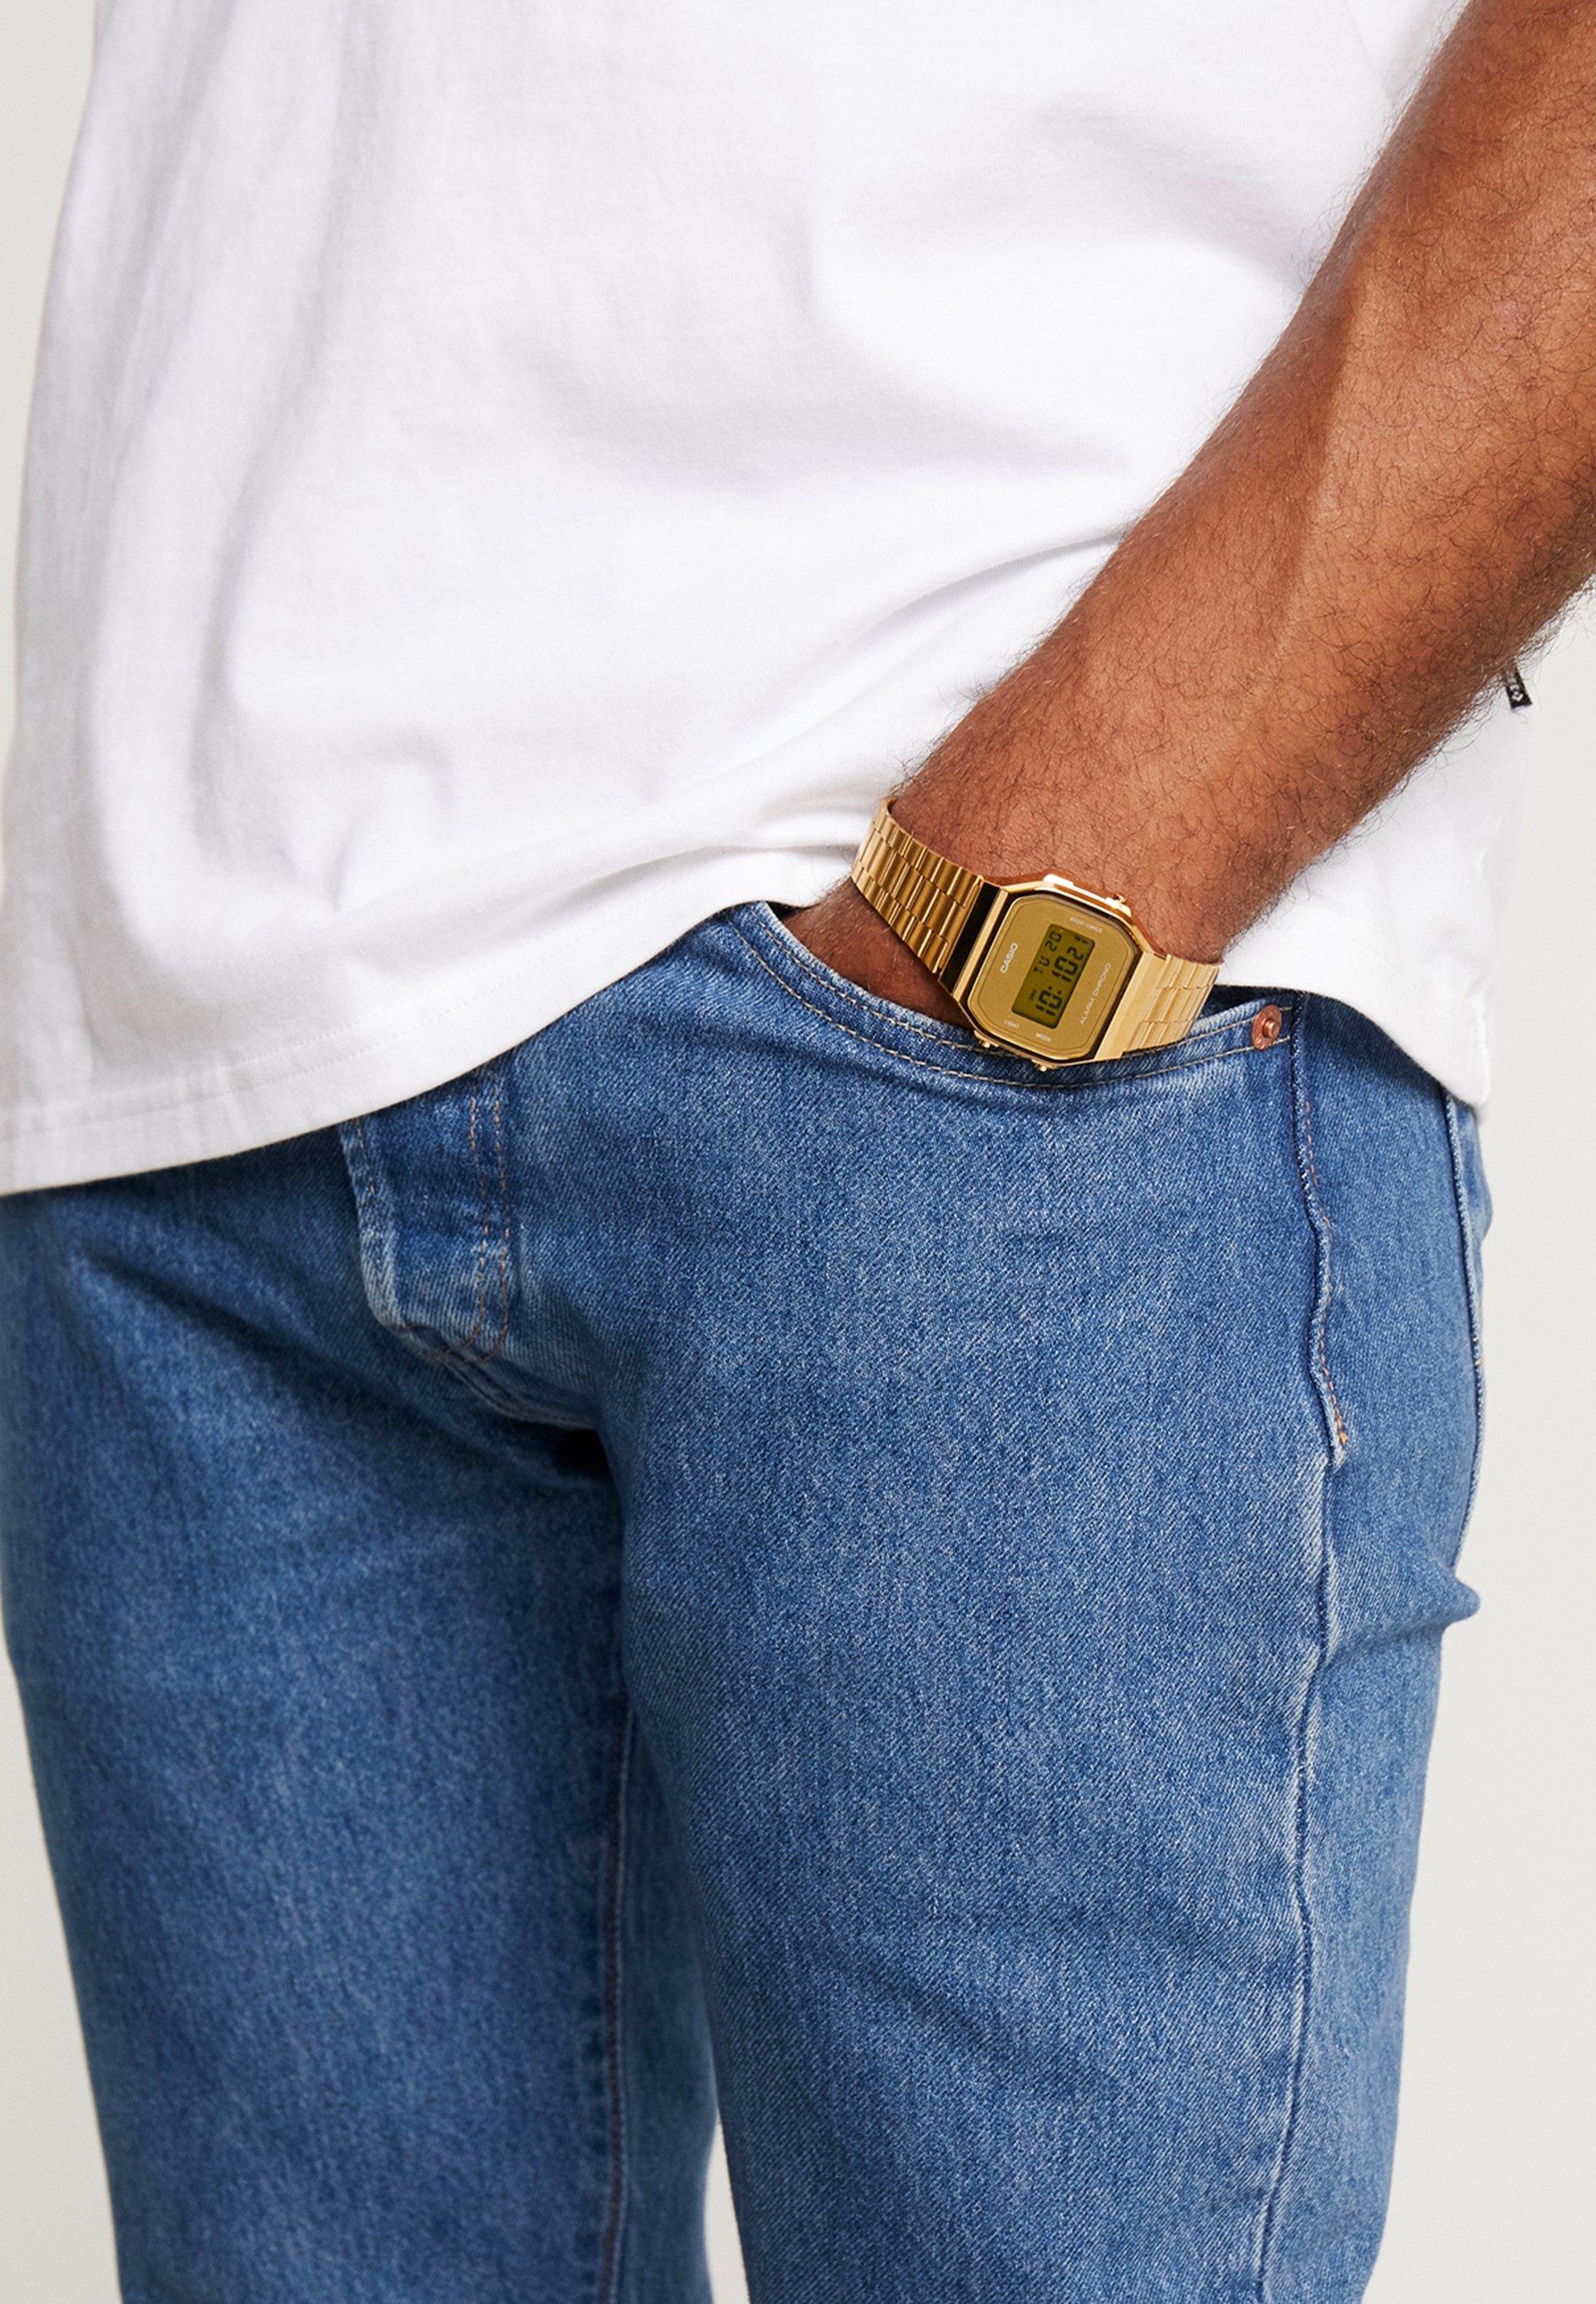 Casio Digitaal horloge - gold-coloured - Dameshorloge Kwaliteit